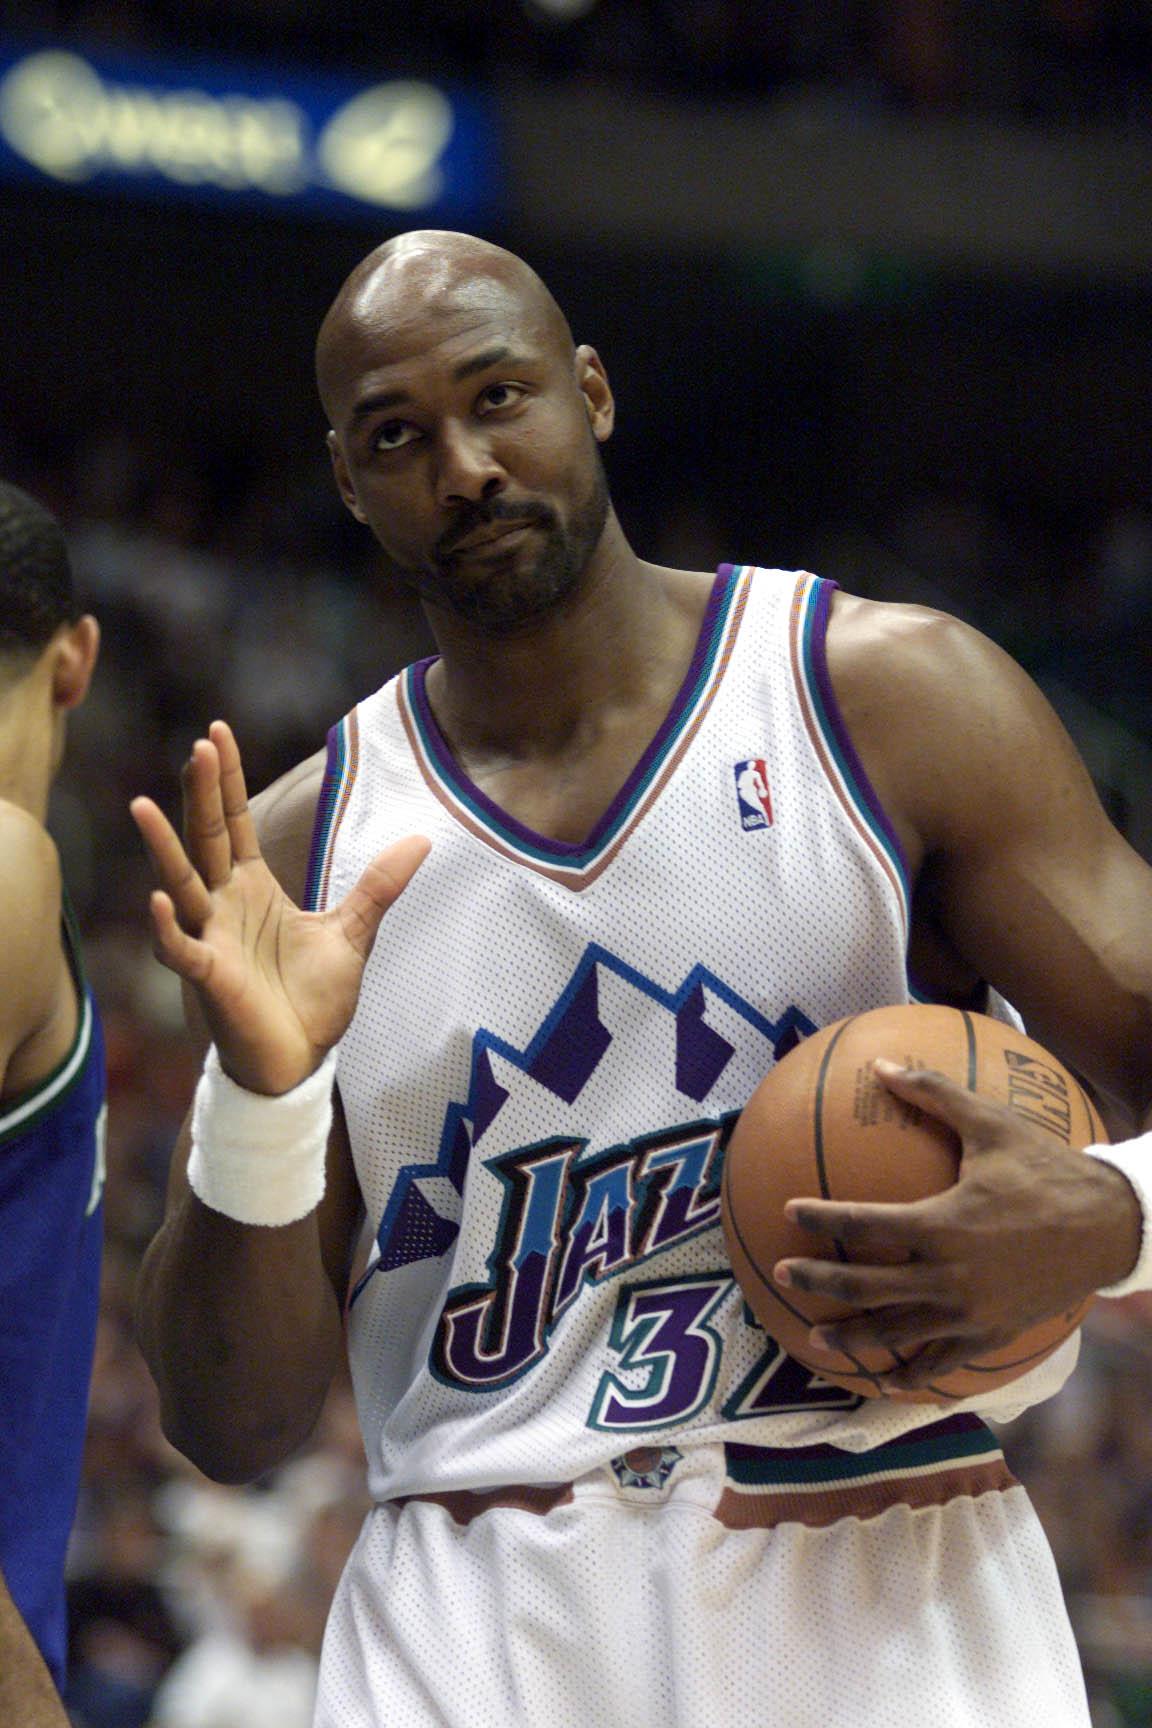 21 Apr 2001:  Karl Malone #32 of the Utah Jazz during game one of the NBA playoffs against the Dallas Mavericks at the Delta Center in Salt Lake City, Utah.  The Jazz won 88-86.  DIGITAL IMAGE.  Mandatory Credit: Brian Bahr/Allsport